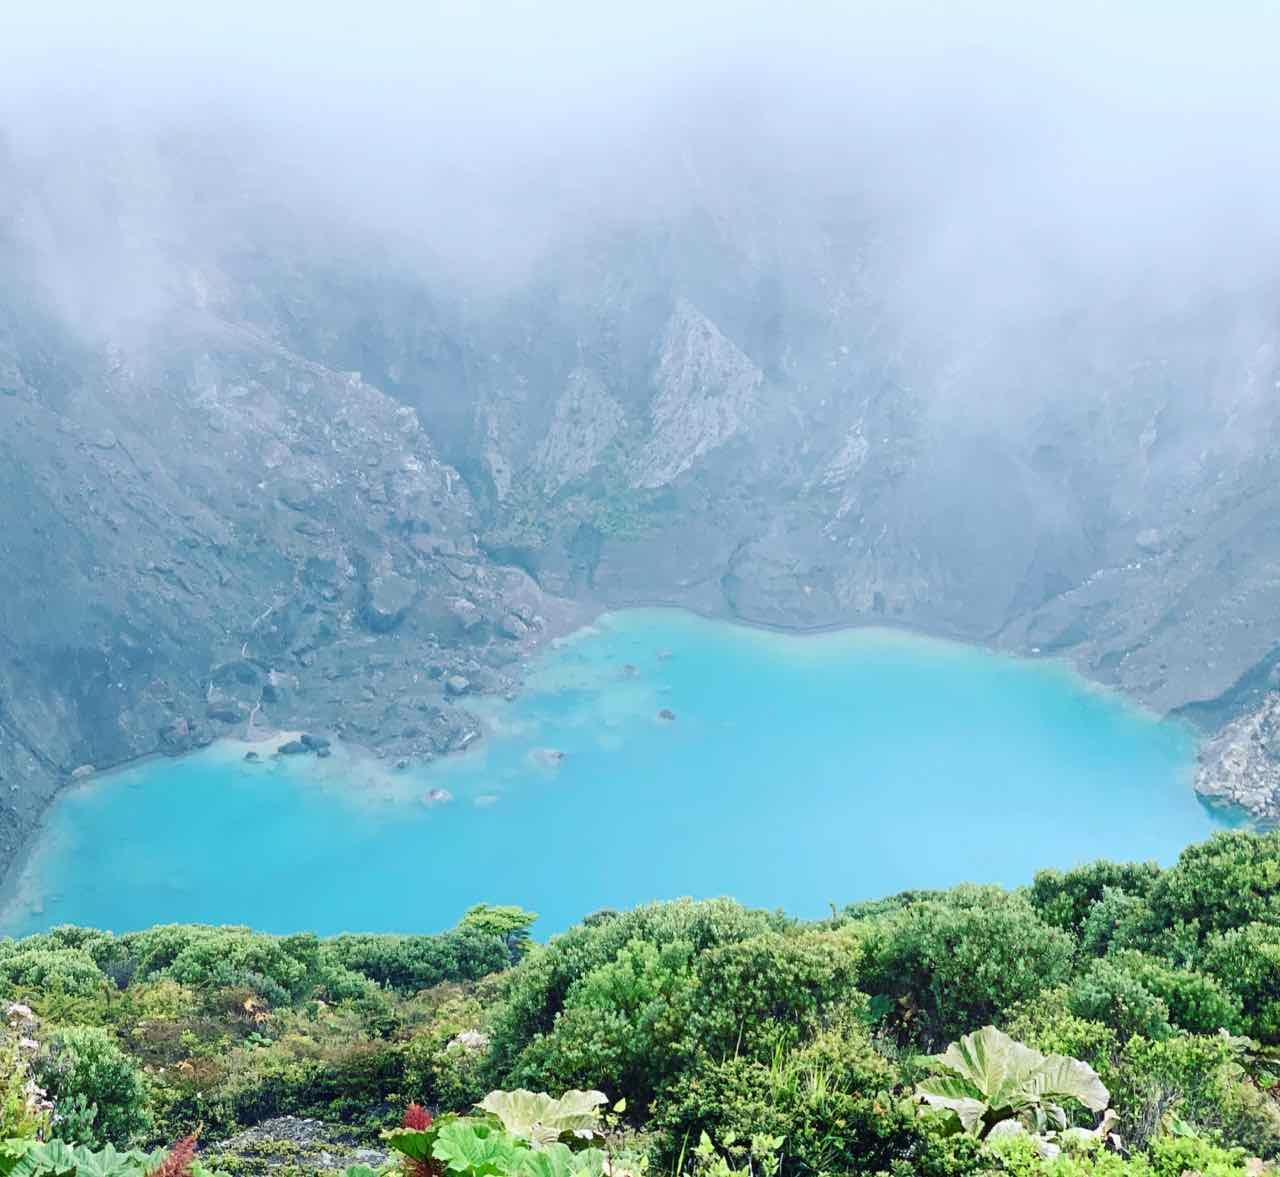 Hauptkrater vom Vulkan Irazu